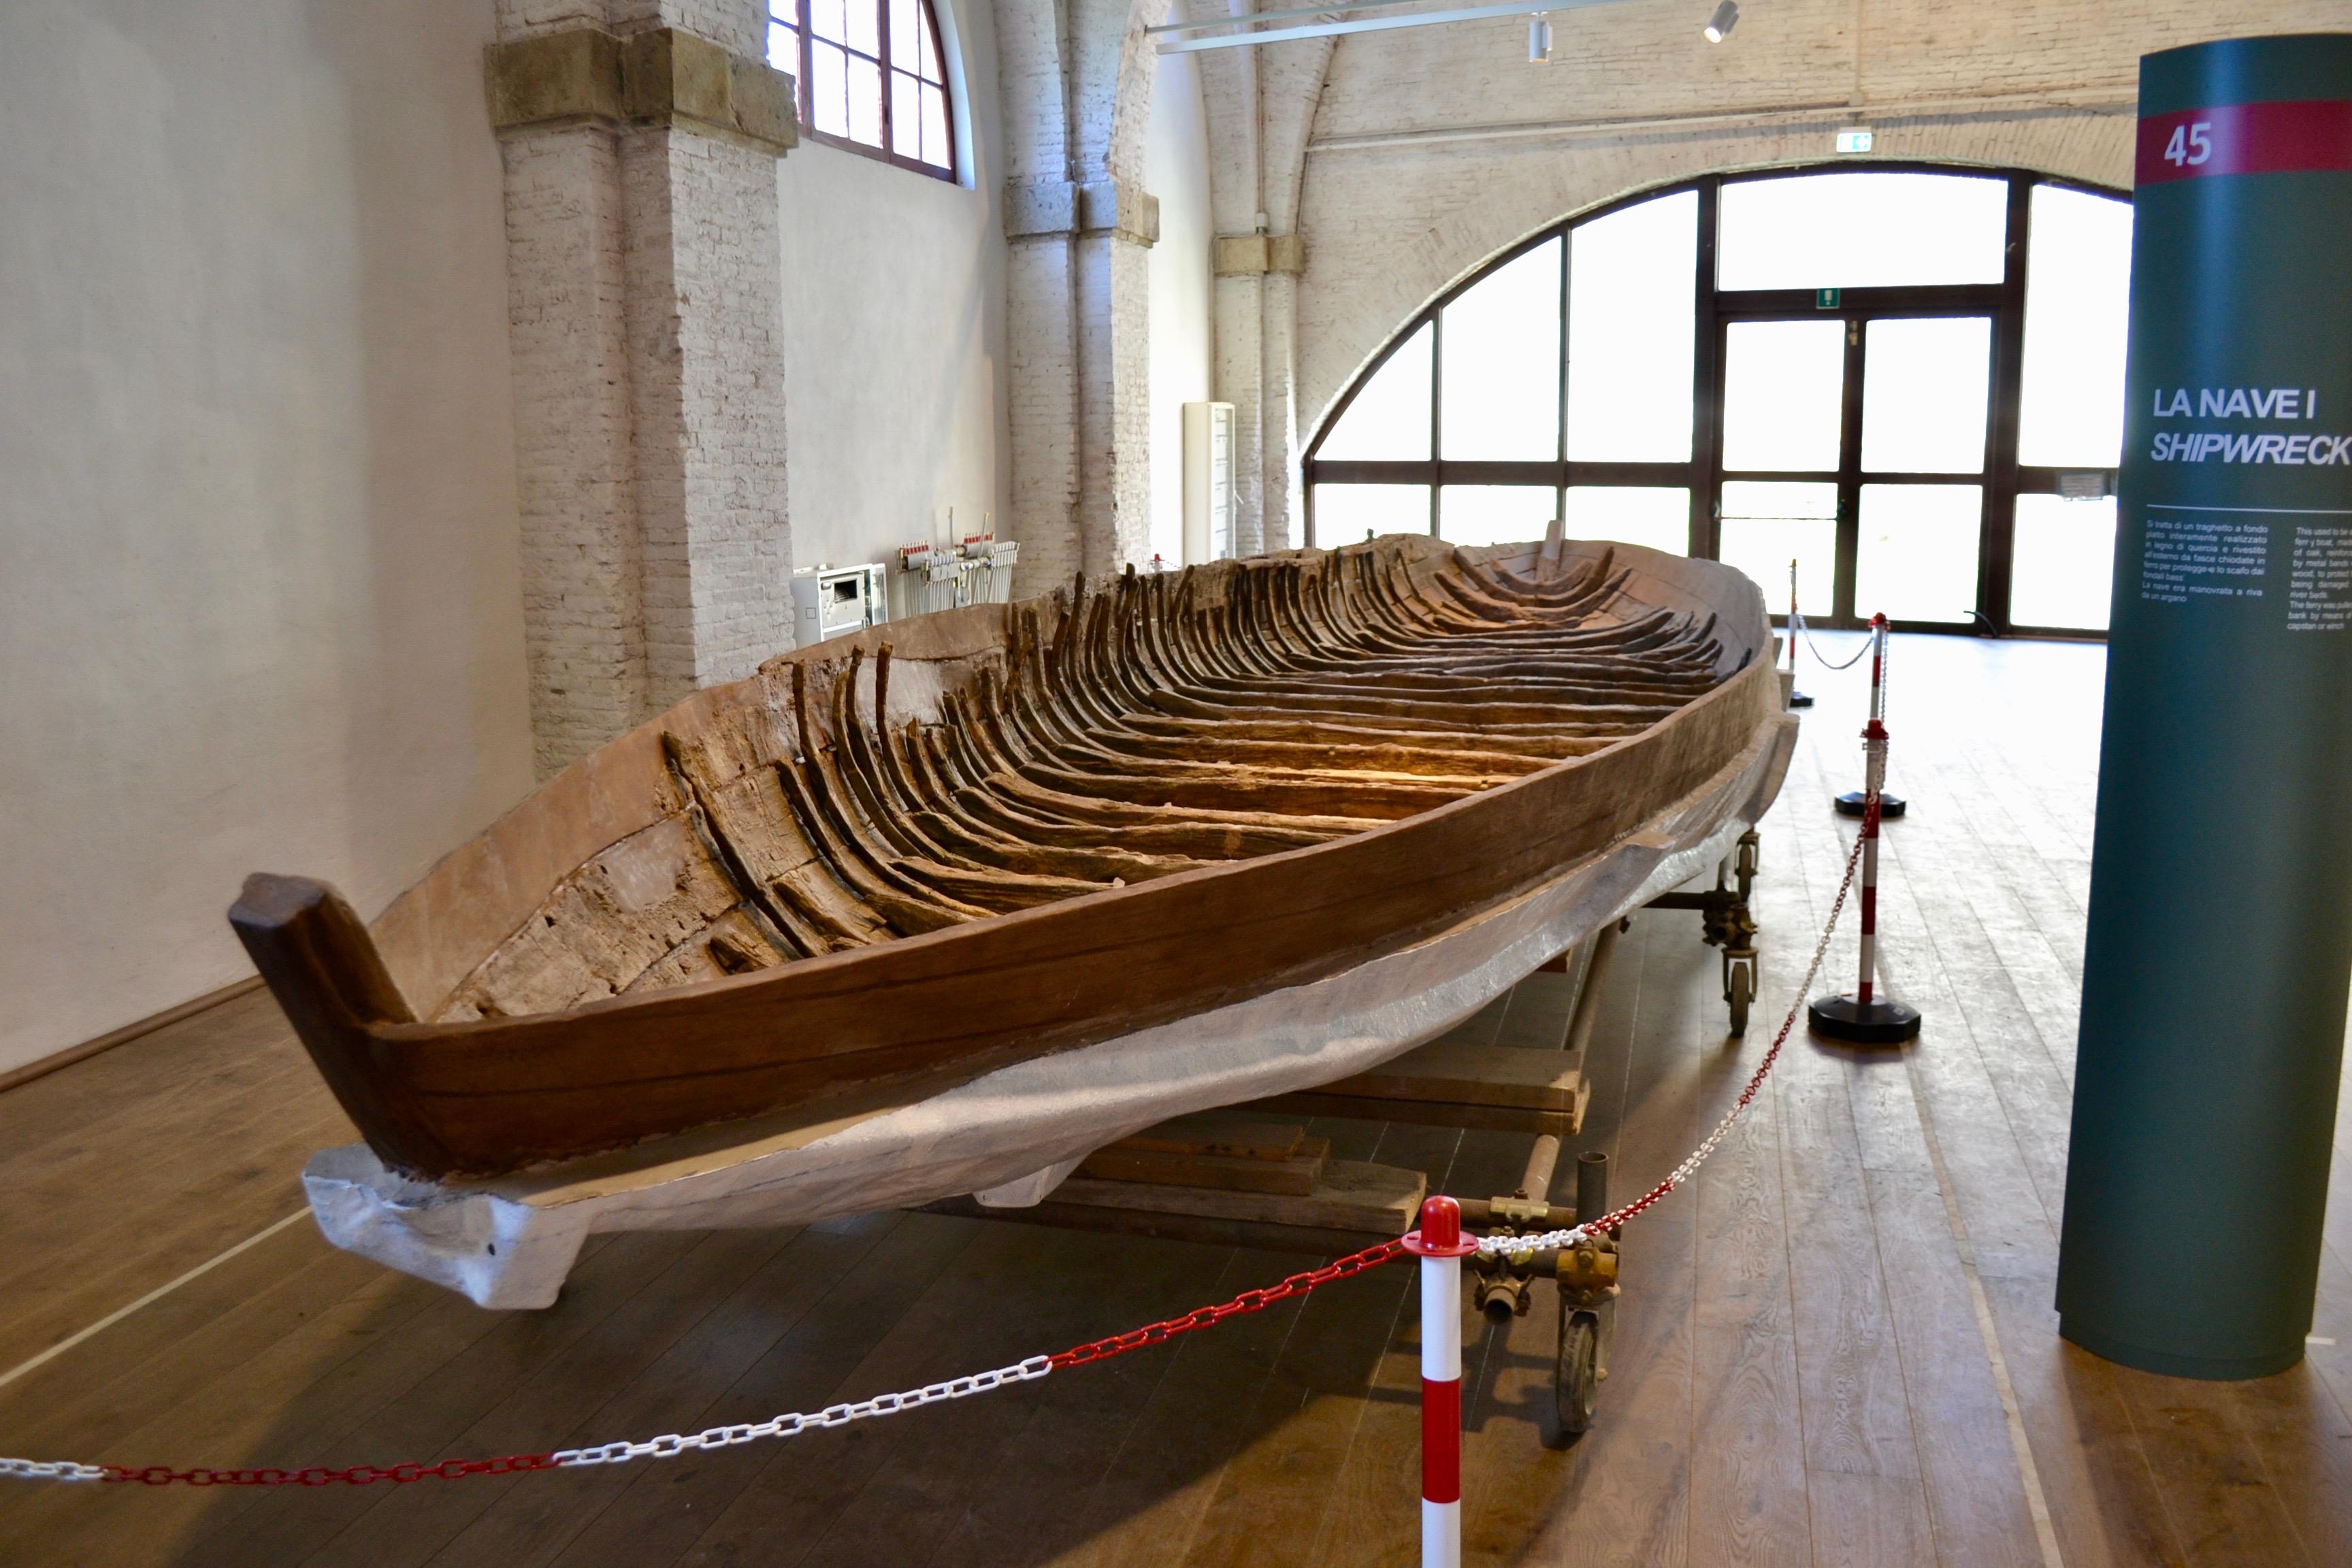 Museo - photo credit: Federigo Federighi